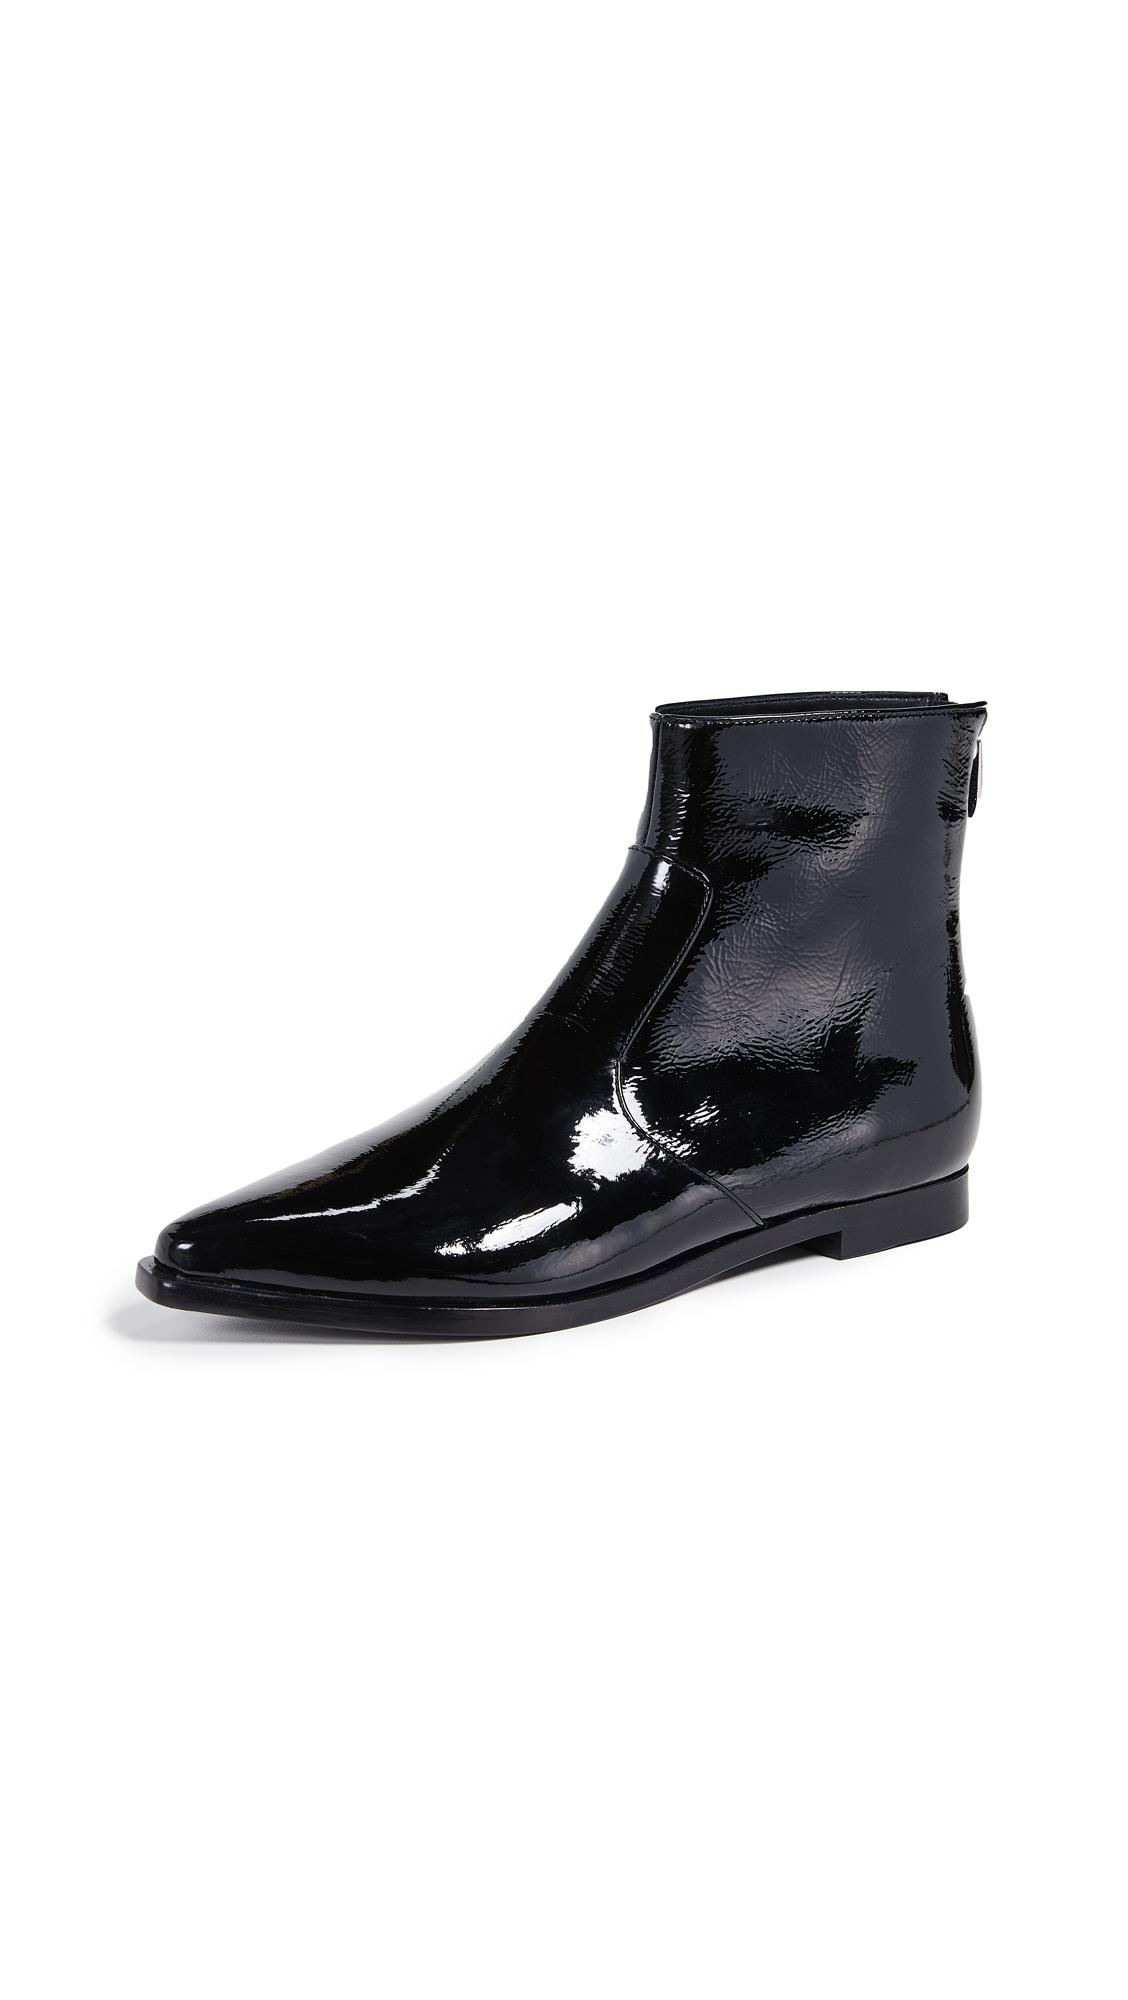 Sigerson Morrison Eranthe Point Toe Booties - Black